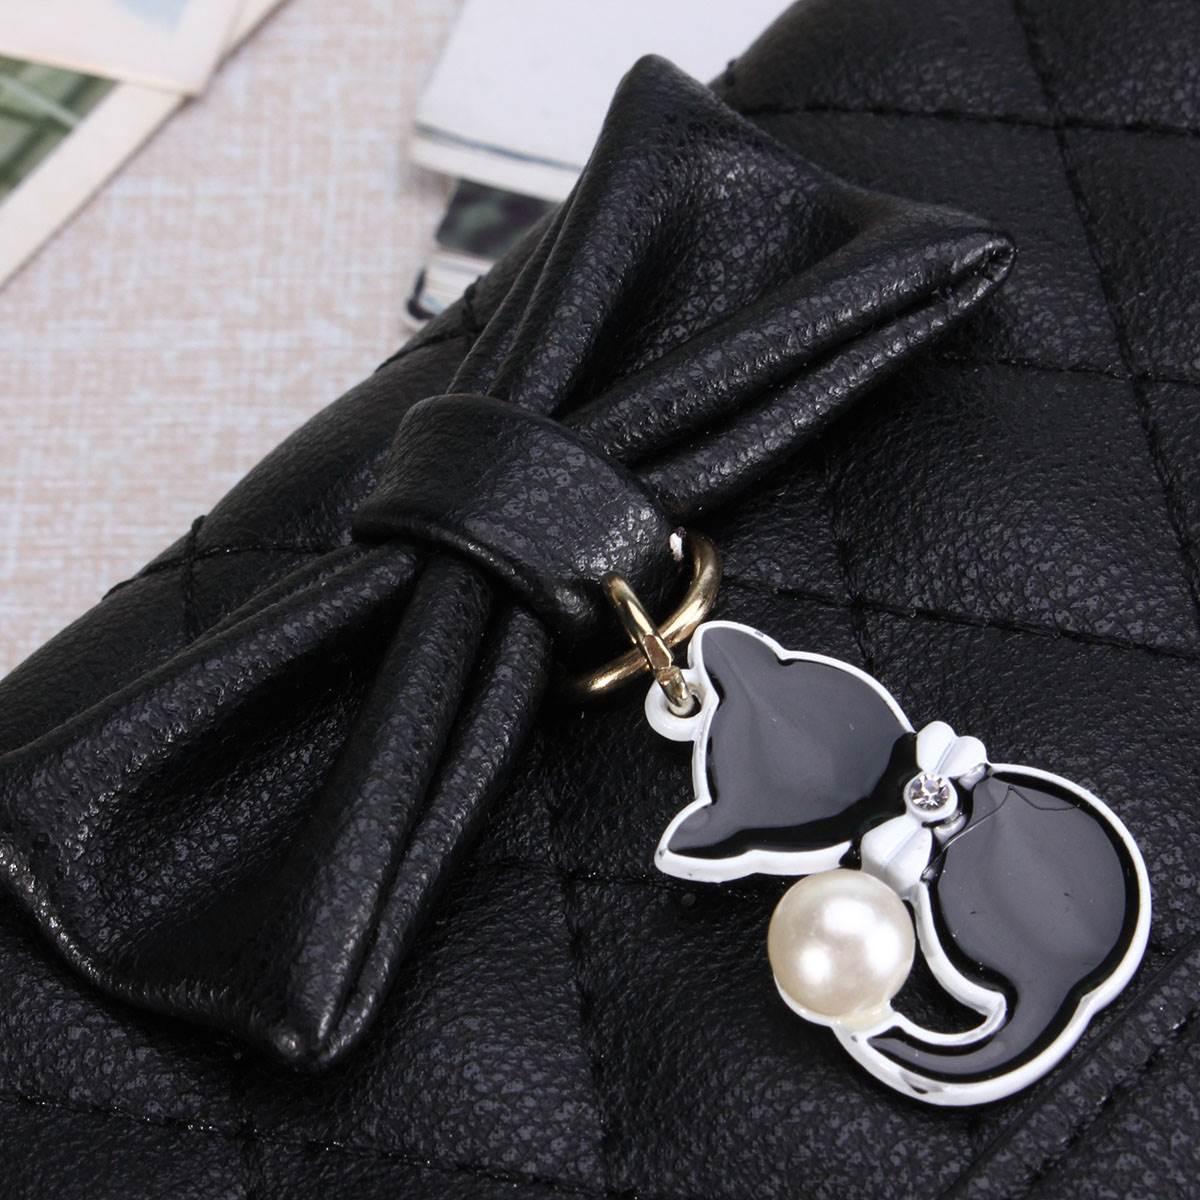 famosa marca feminina carteira mulheres Wallet Estilo 2 : Fashion Tassel Wallet Women